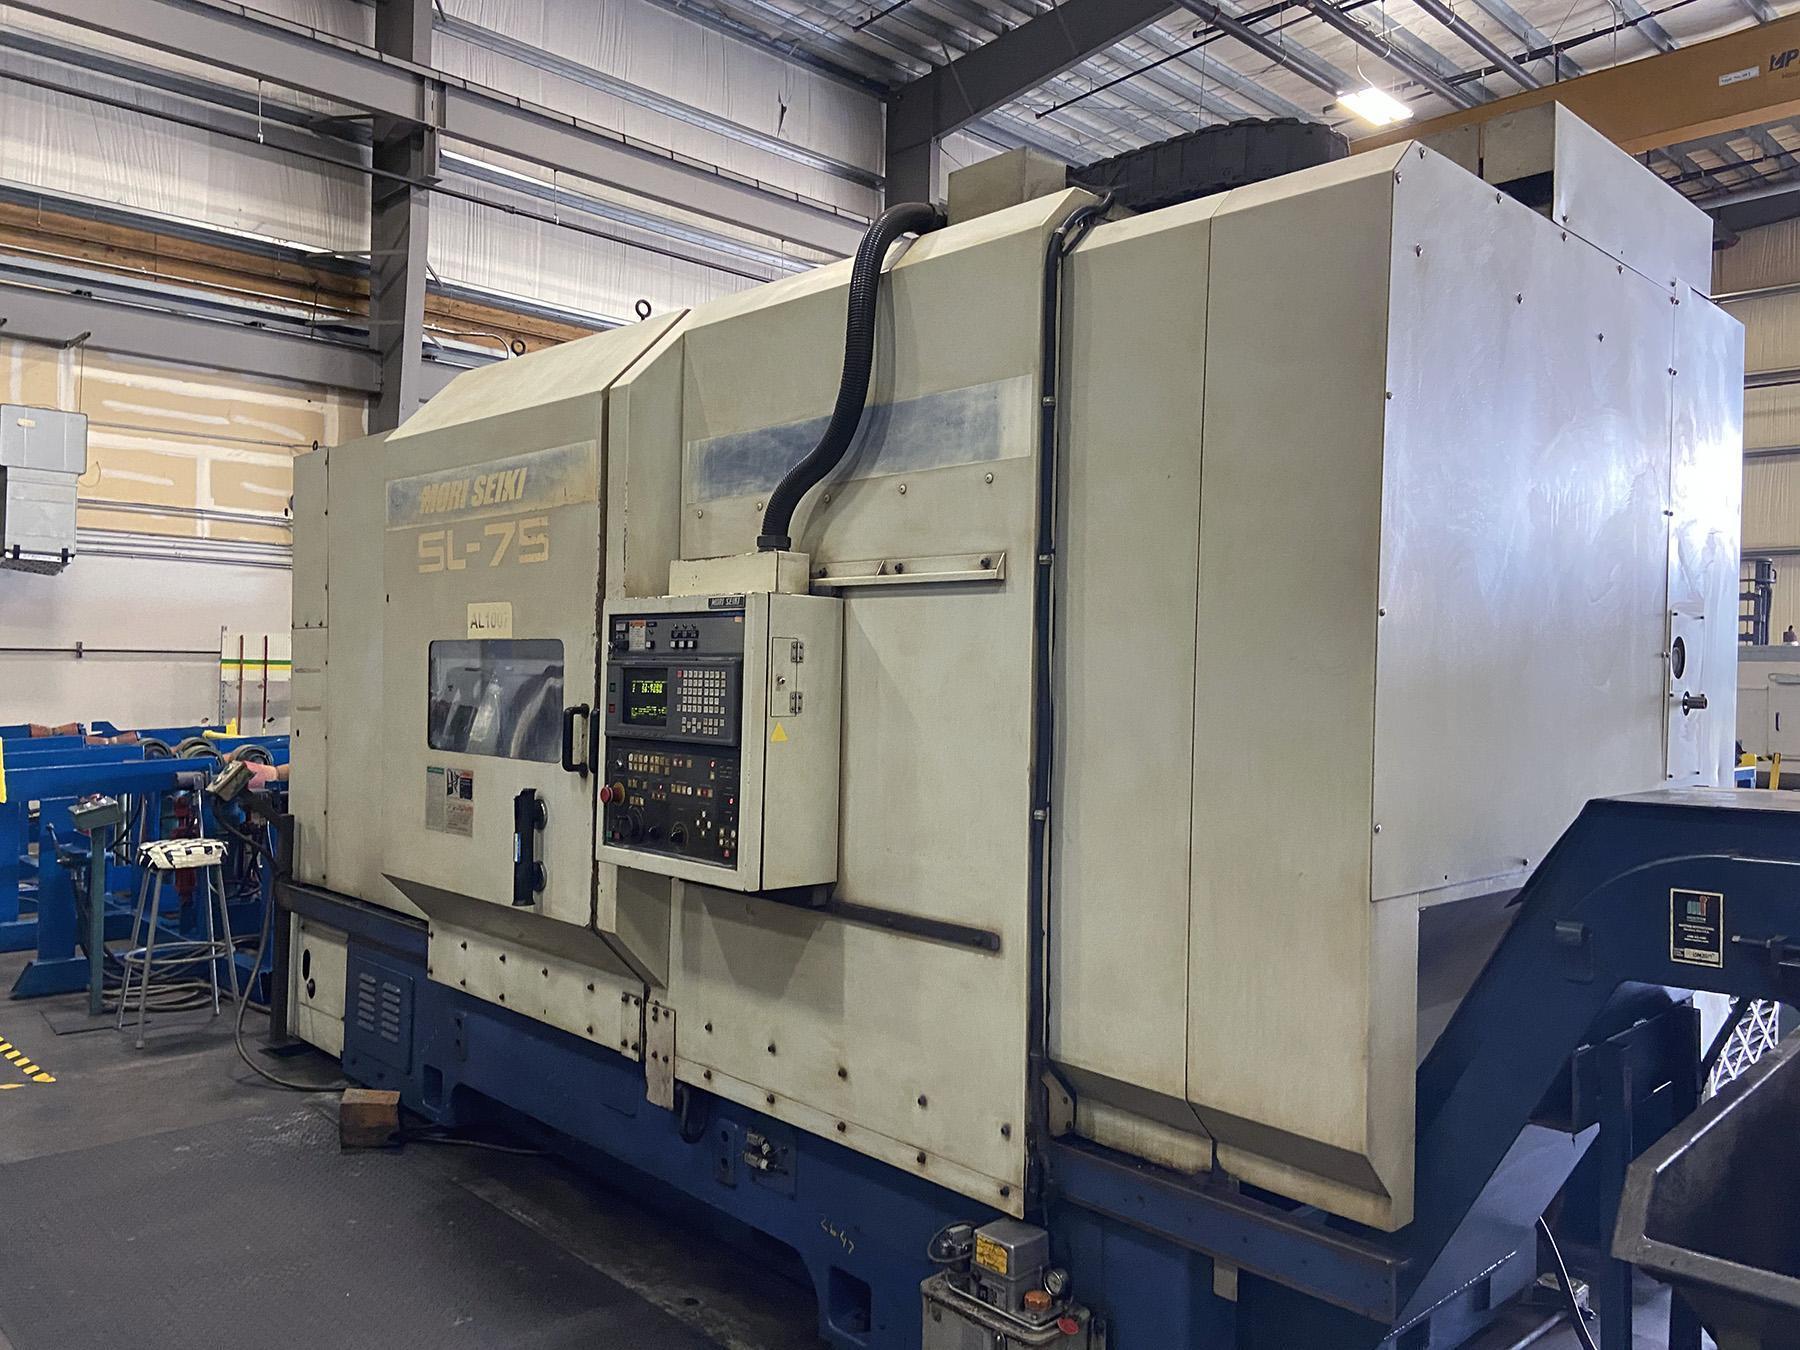 USED, Mori Seiki SL-75C CNC Lathe